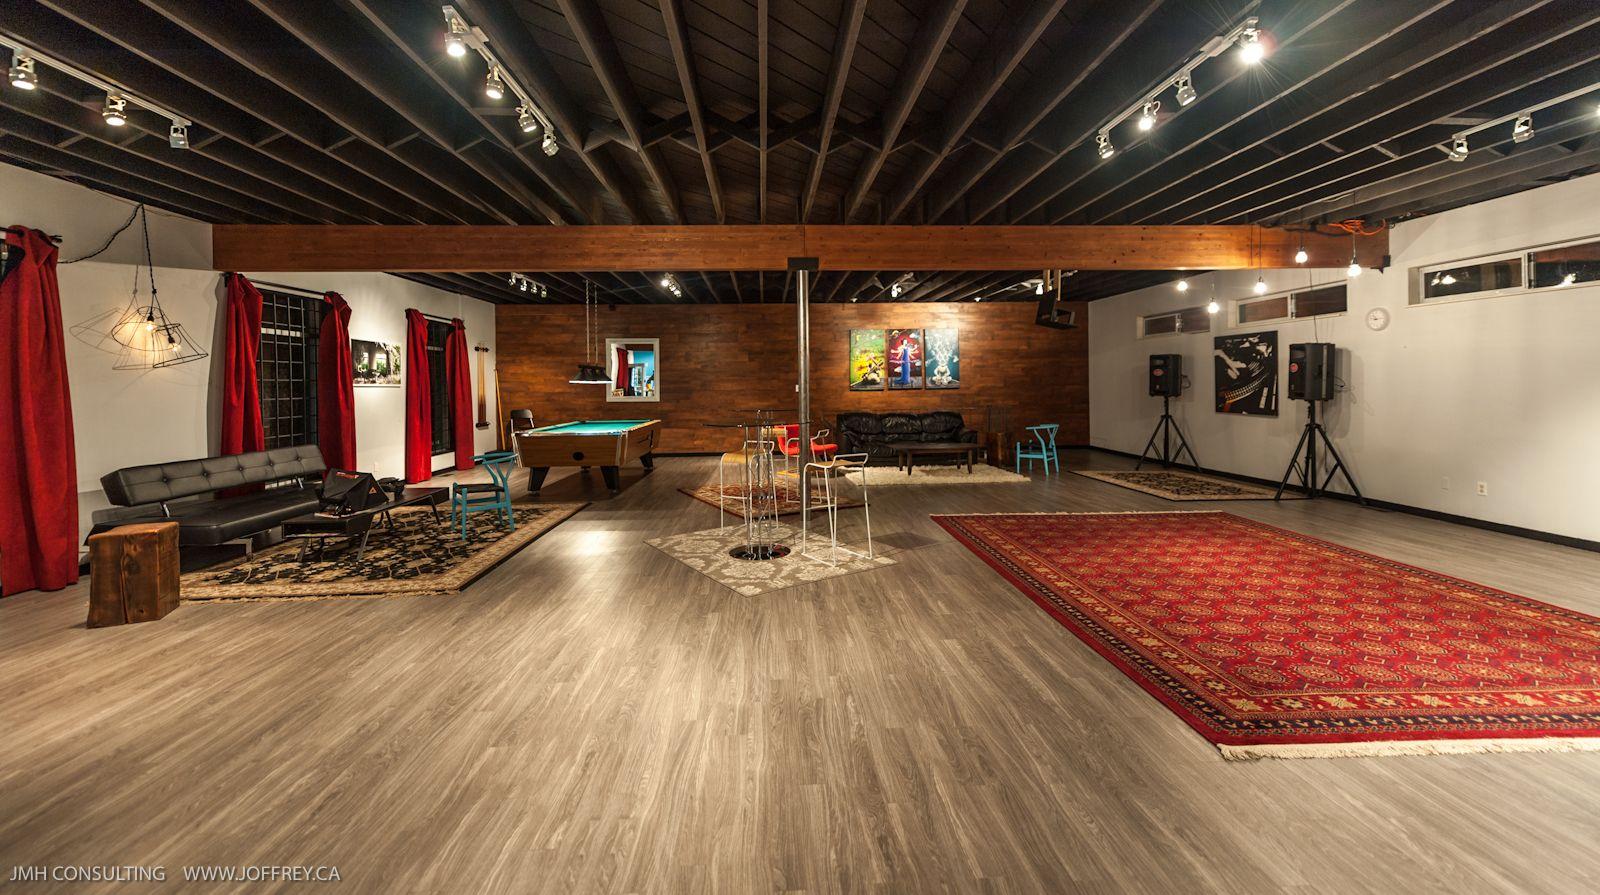 Studio House Design Html on studio garage, studio soundboard, studio insulation, studio building, studio lamps, studio interior, studio doors, studio mumbai, studio bathroom, studio drawing, studio blueprints, studio storage, studio wall, studio office, studio home, studio theatre, studio space, studio ad, studio set up, studio control room,